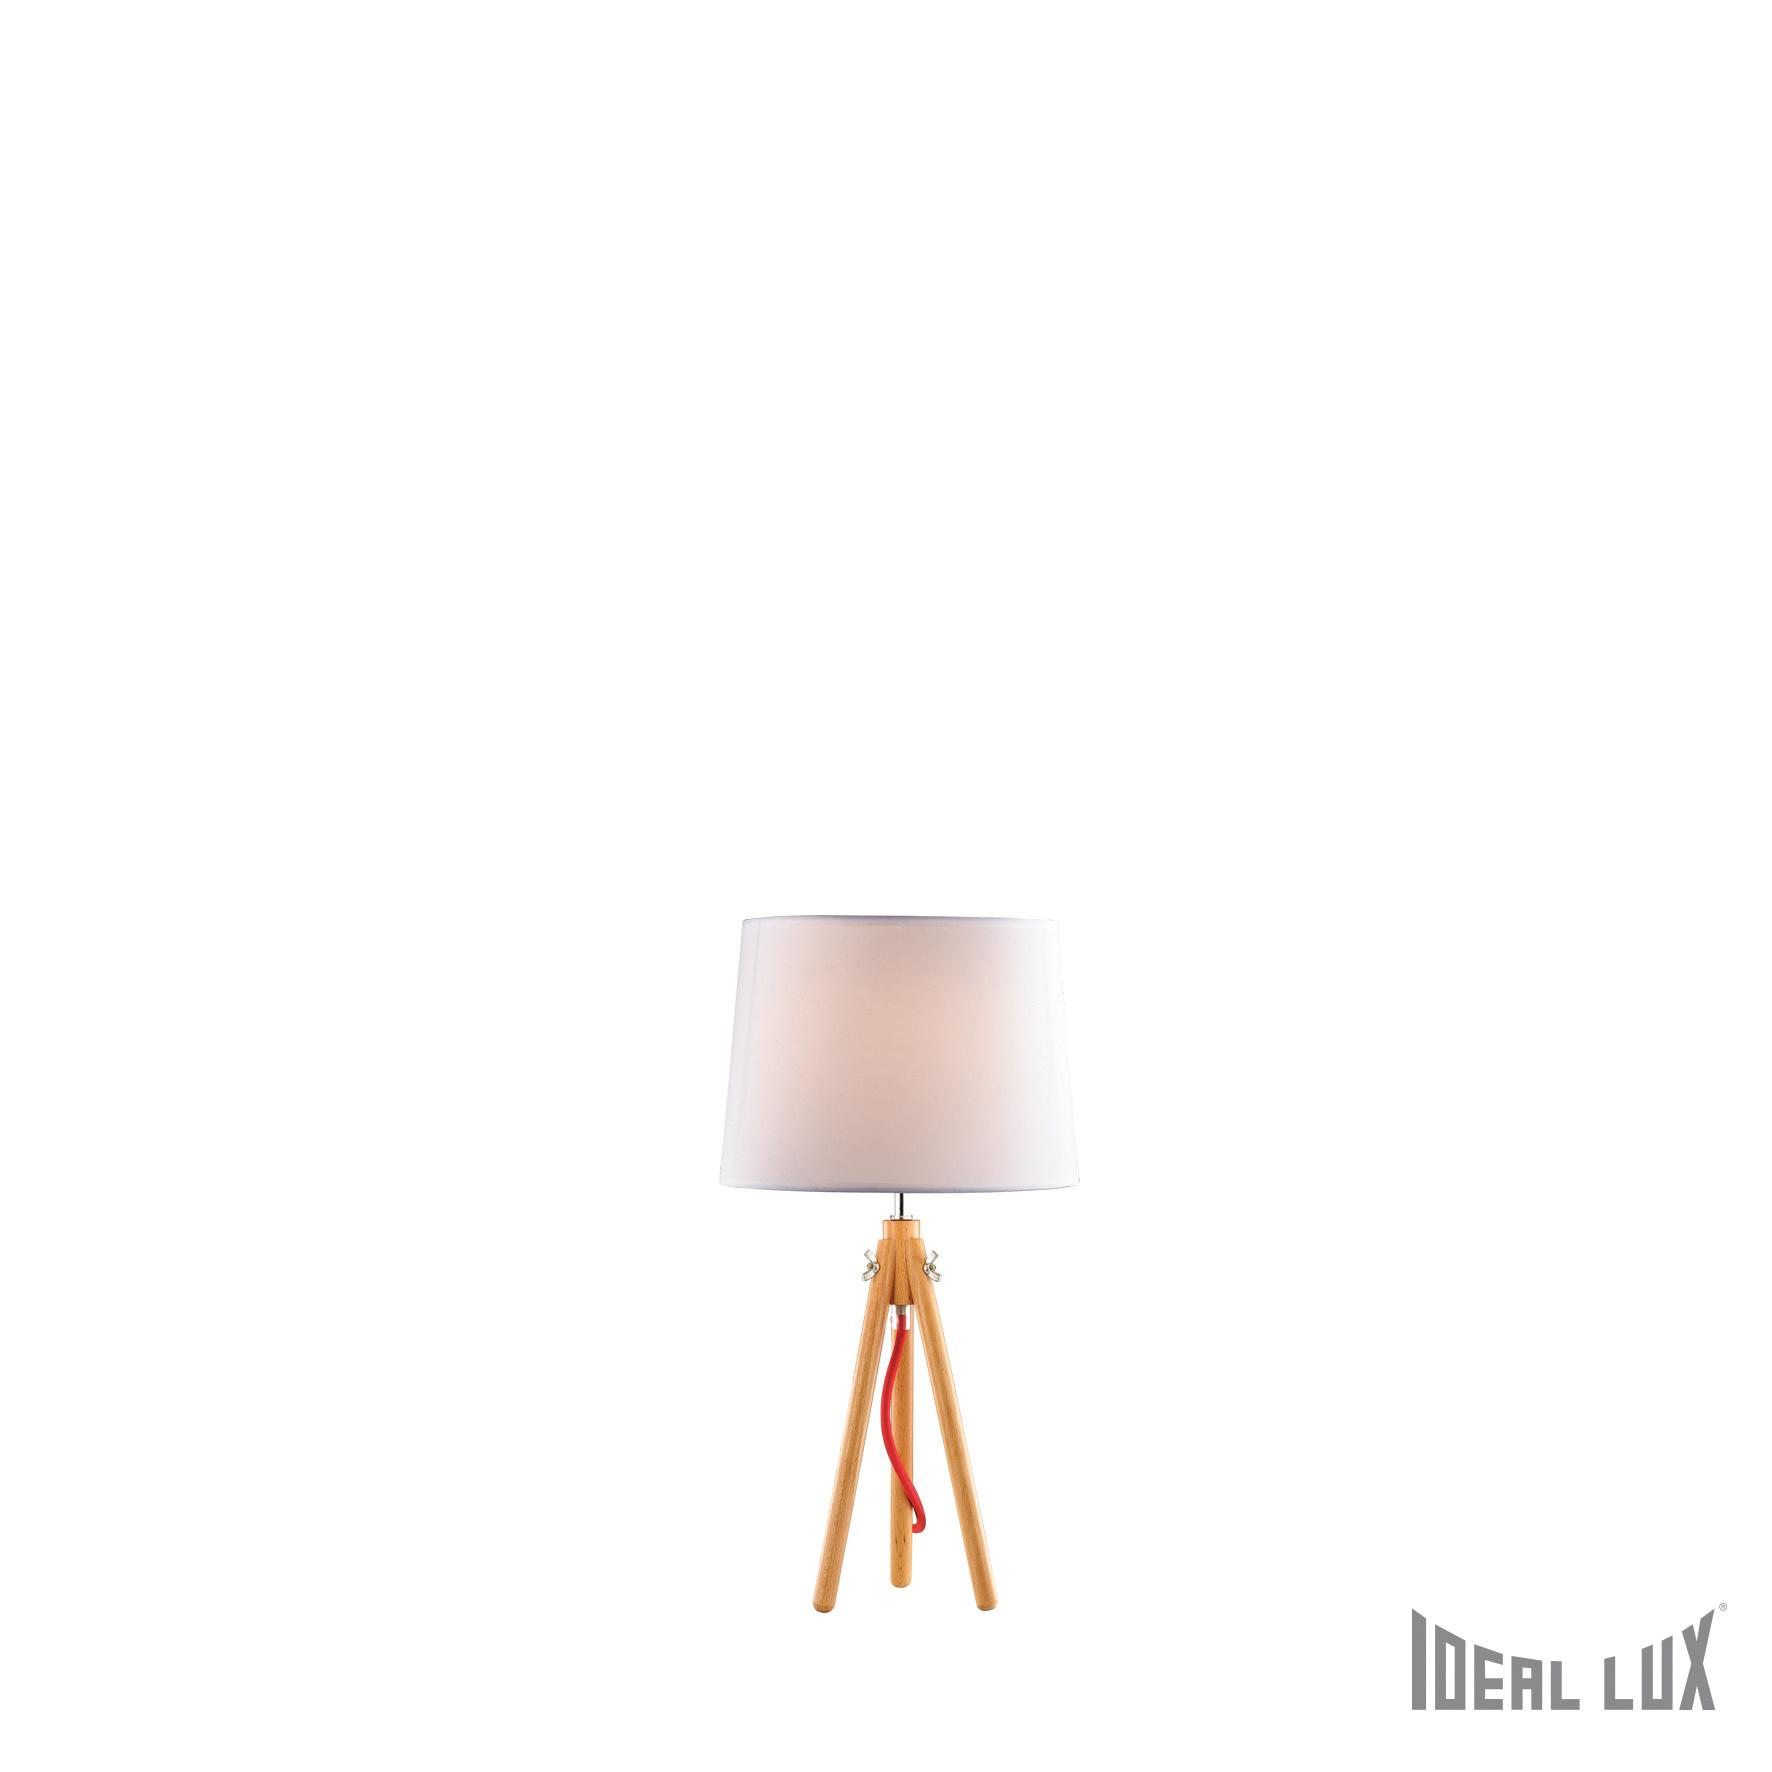 Lampa de birou York TL1 Small title=Lampa de birou York TL1 Small